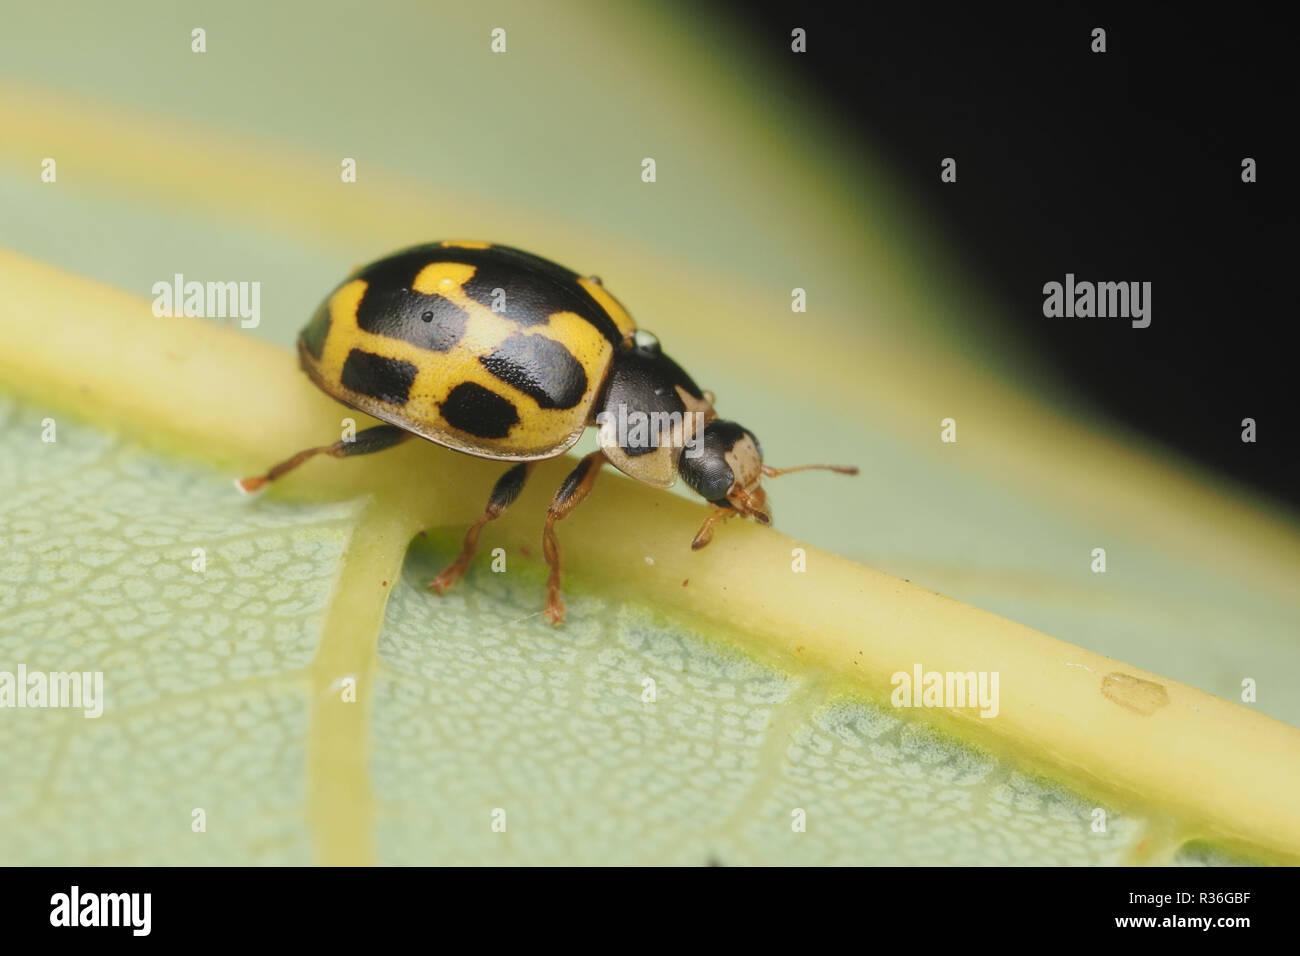 14 Spot Ladybird Propylea Quattuordecimpunctata Crawling Along